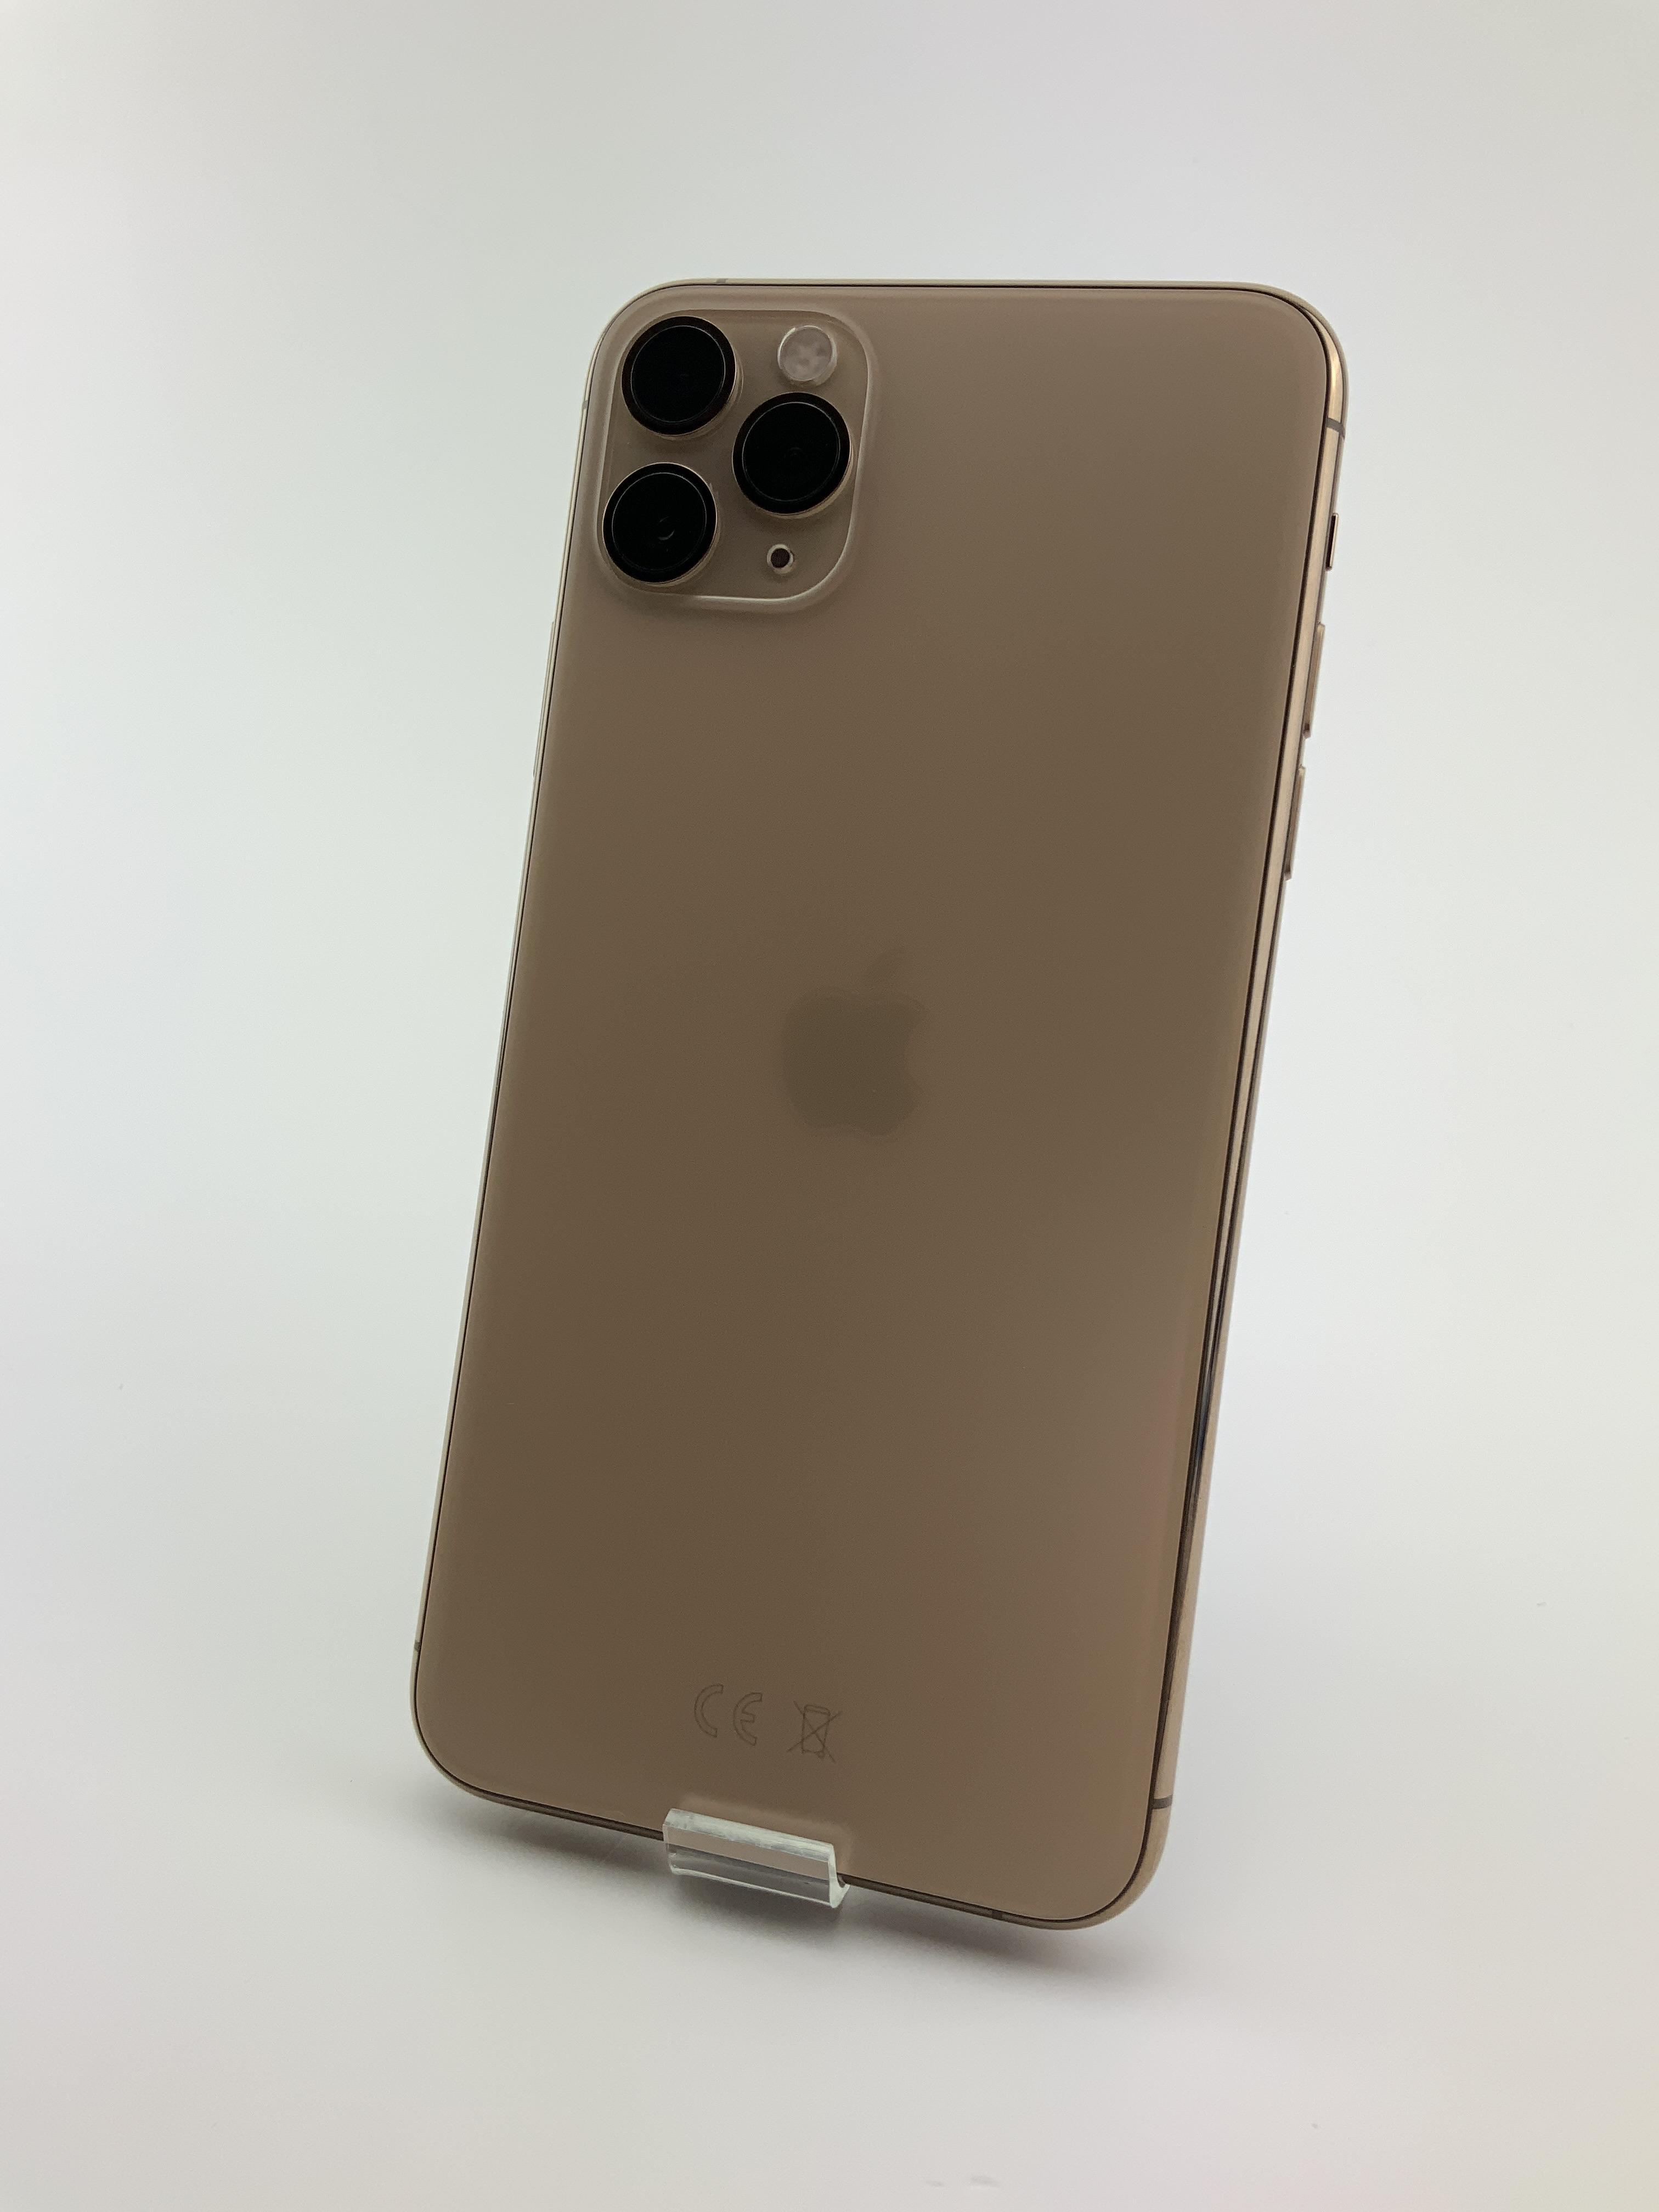 iPhone 11 Pro Max 64GB, 64GB, Gold, immagine 2